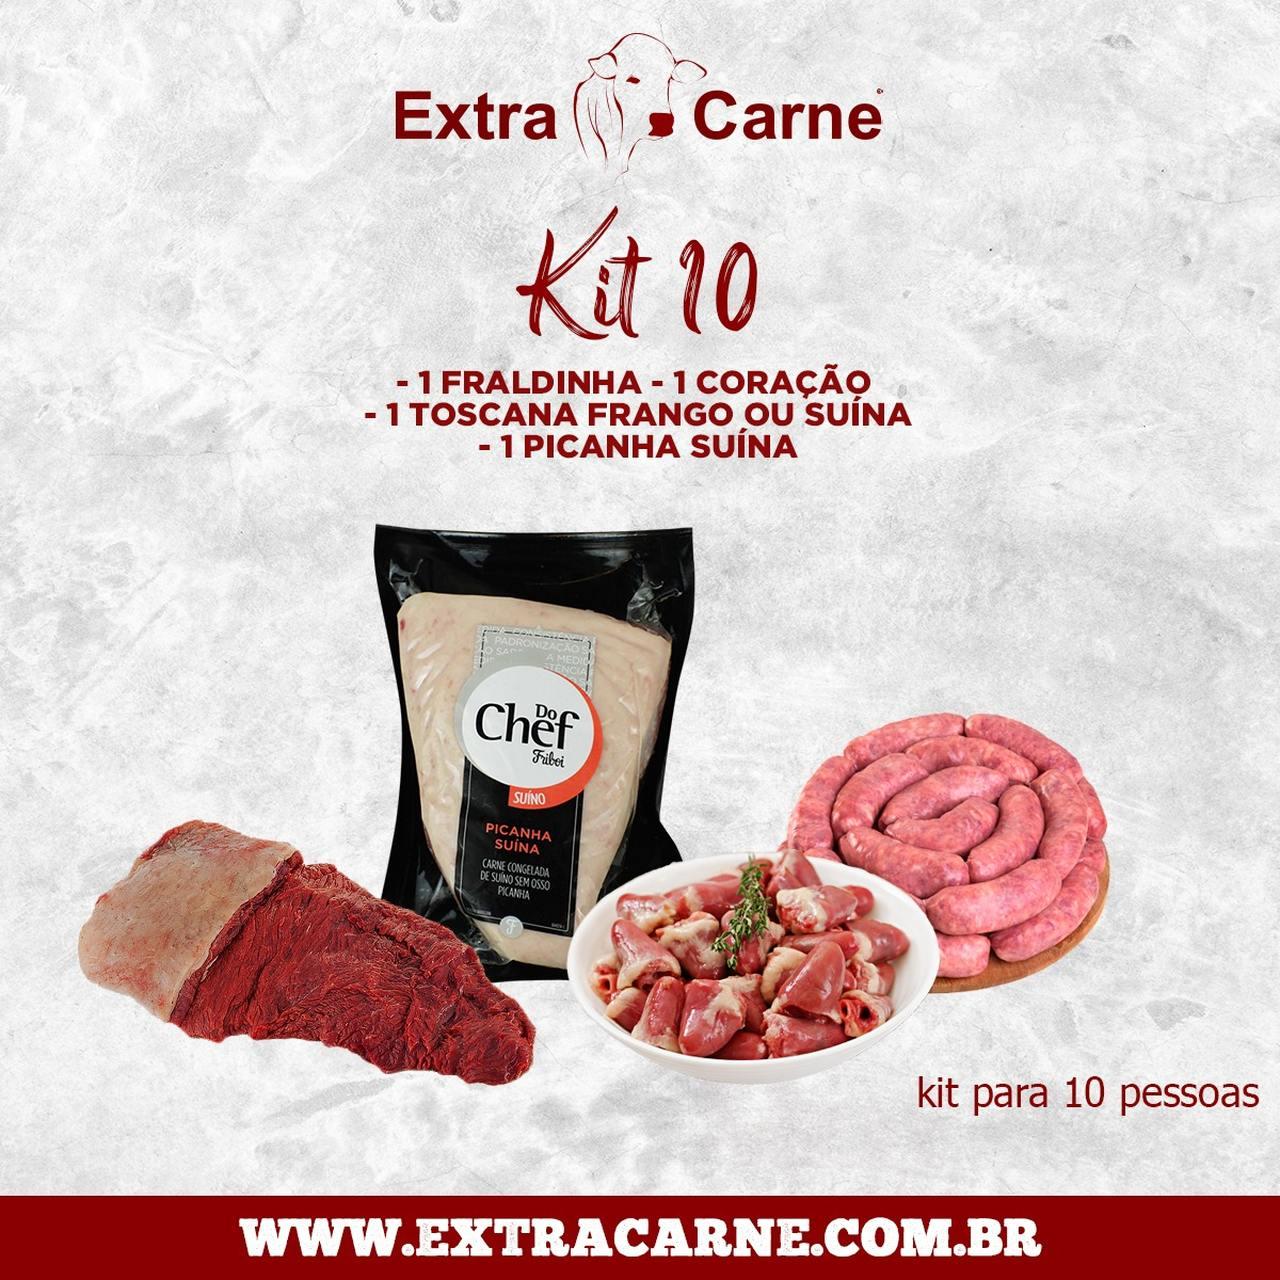 KIT 10 - SERVE 10 PESSOAS